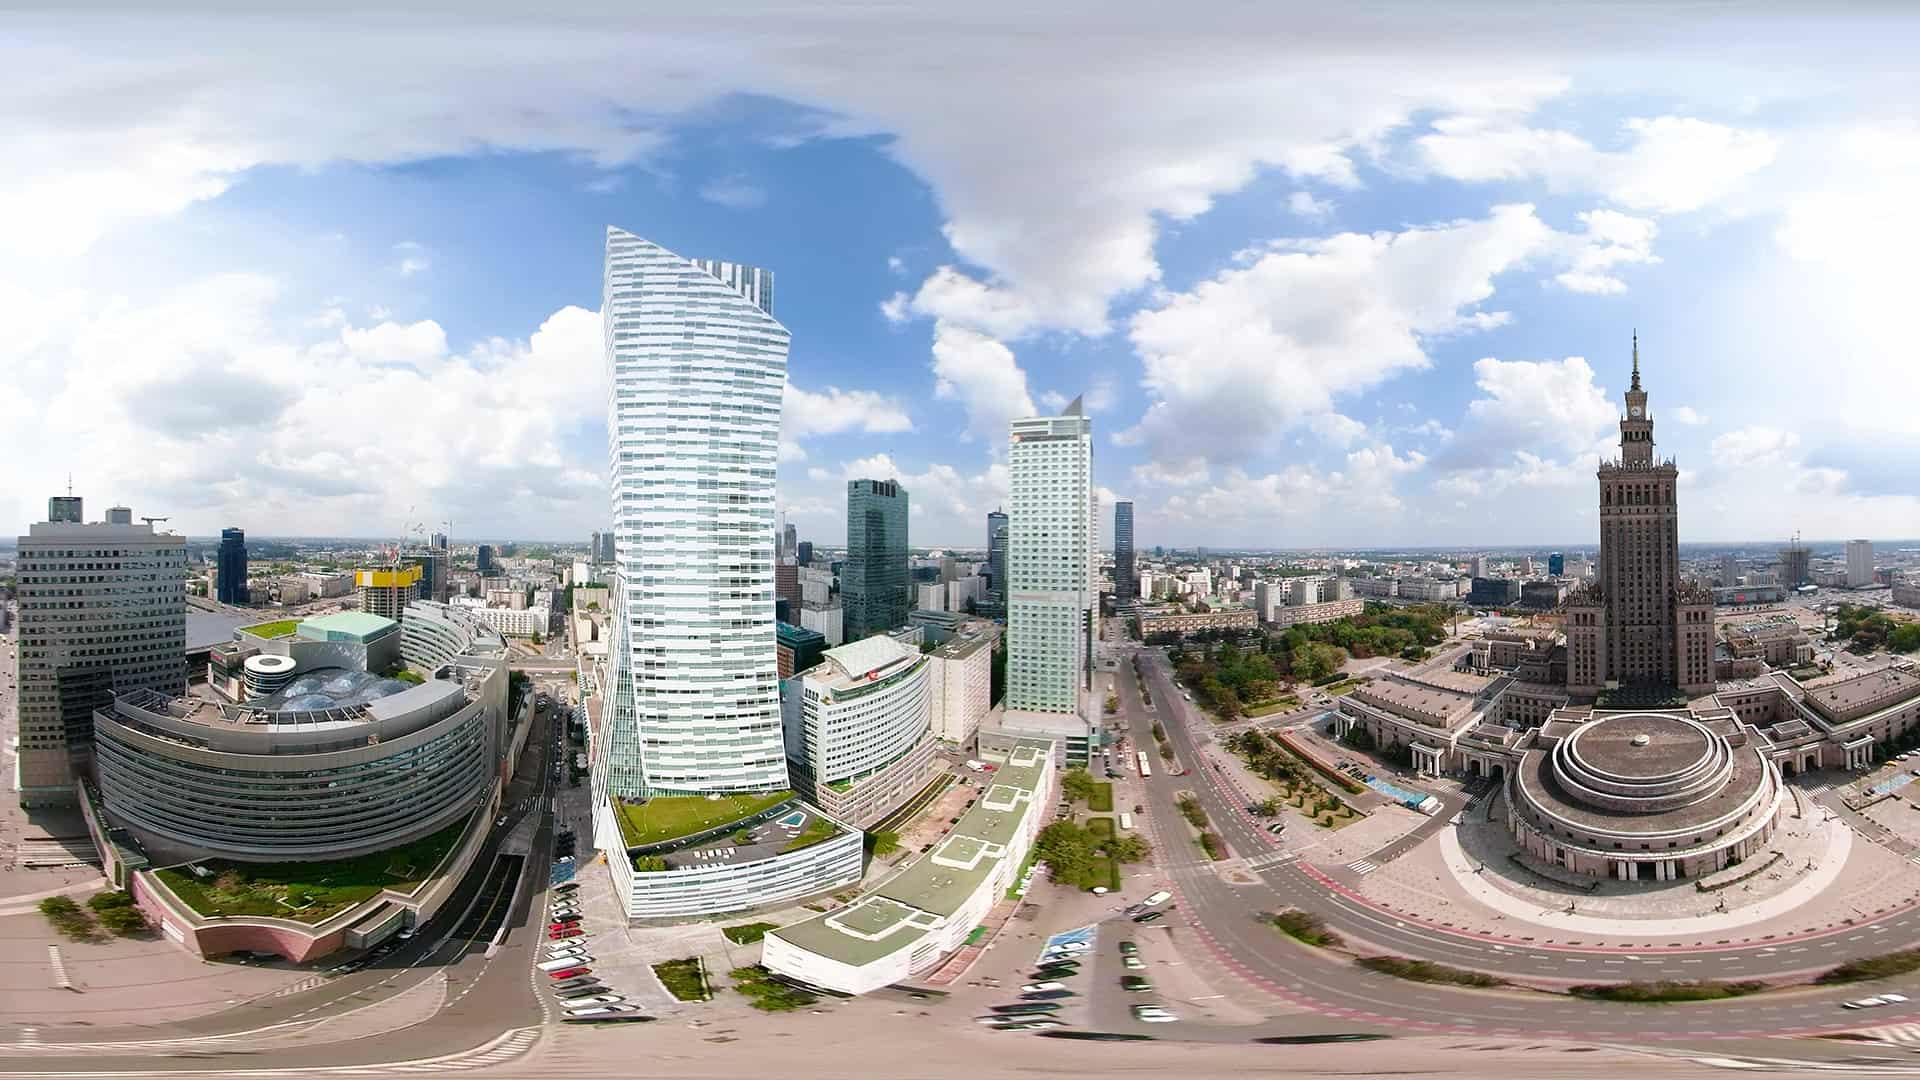 CinematicVR - Realizujemy Projekty Na Terenie Całej Polski I Poza Jej Granicami.